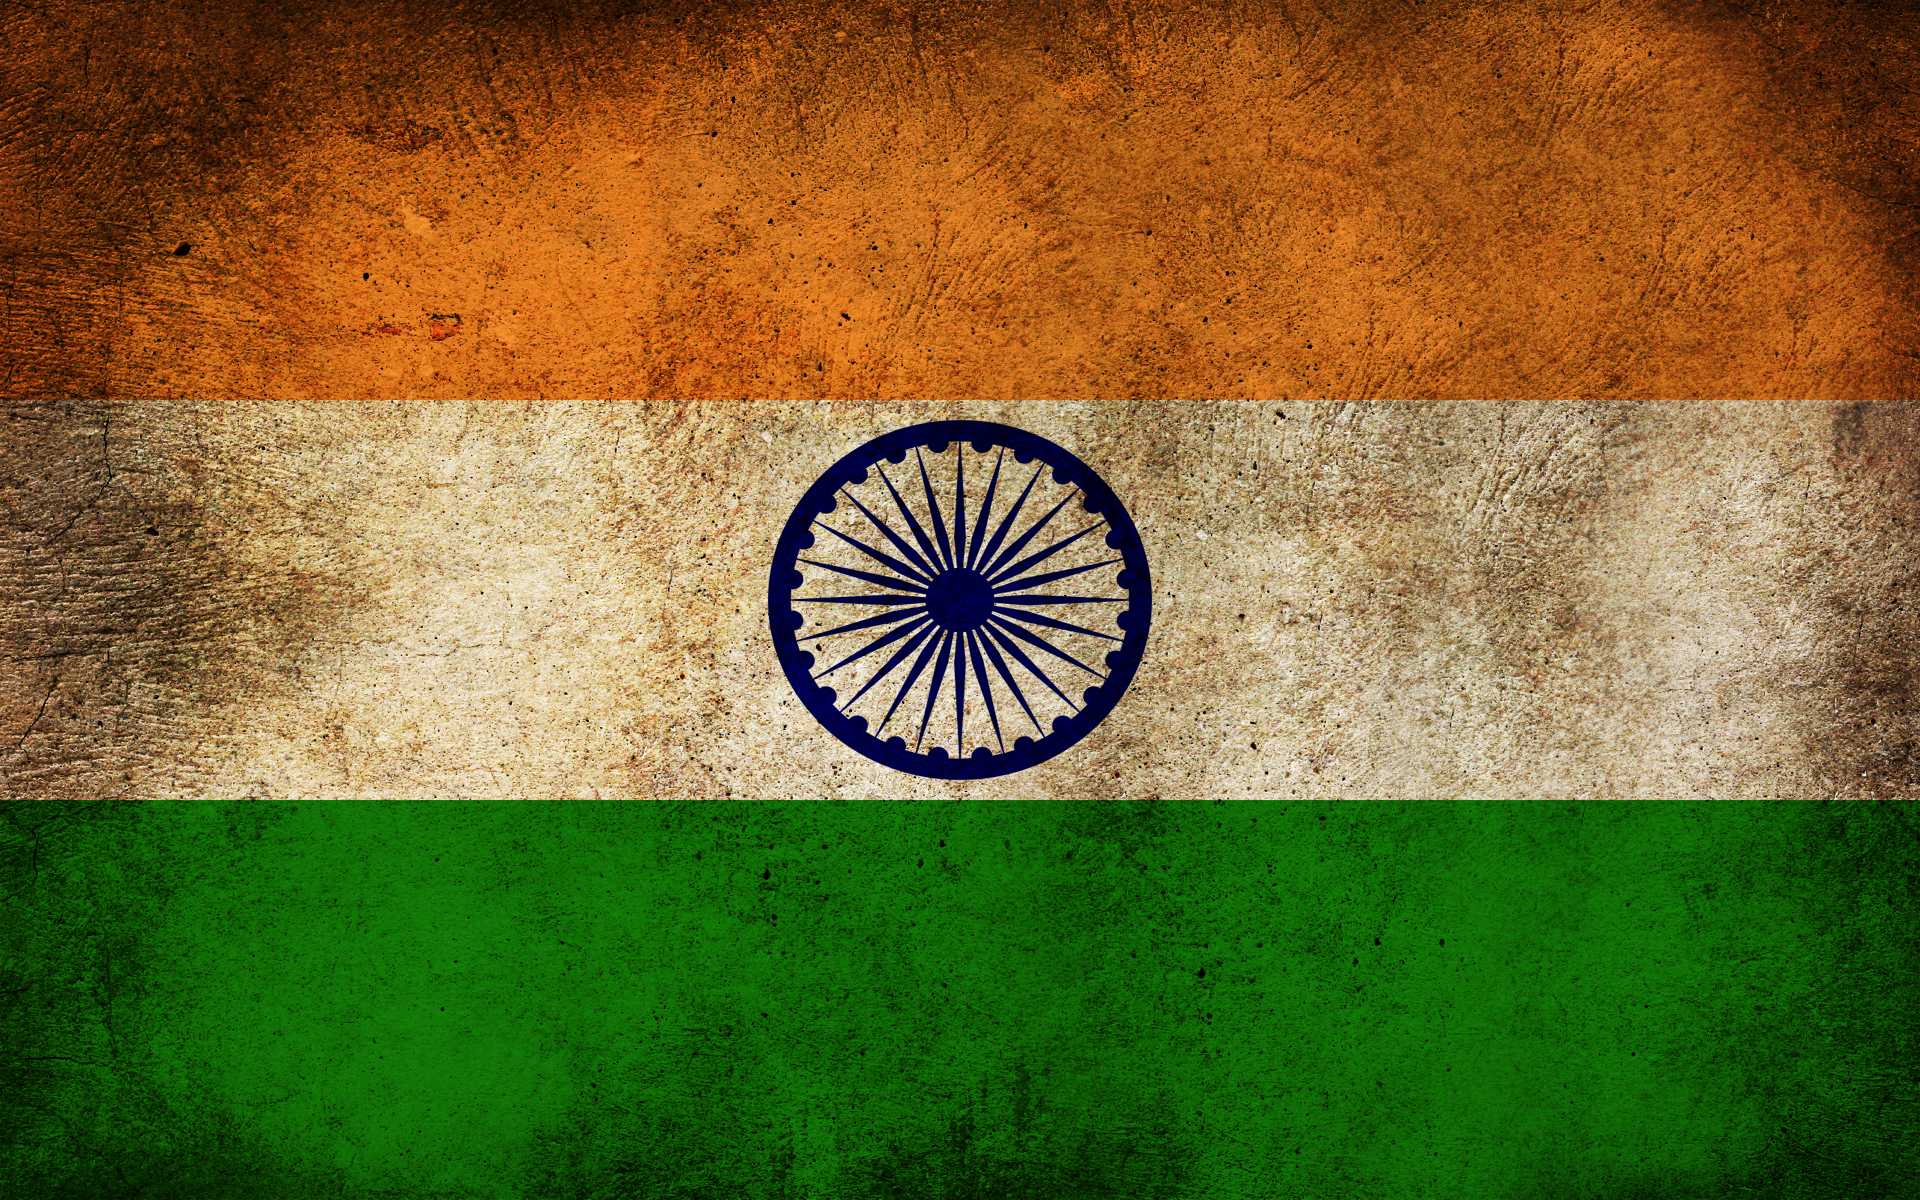 wallpaper flag grunge india 1920x1200 1920x1200